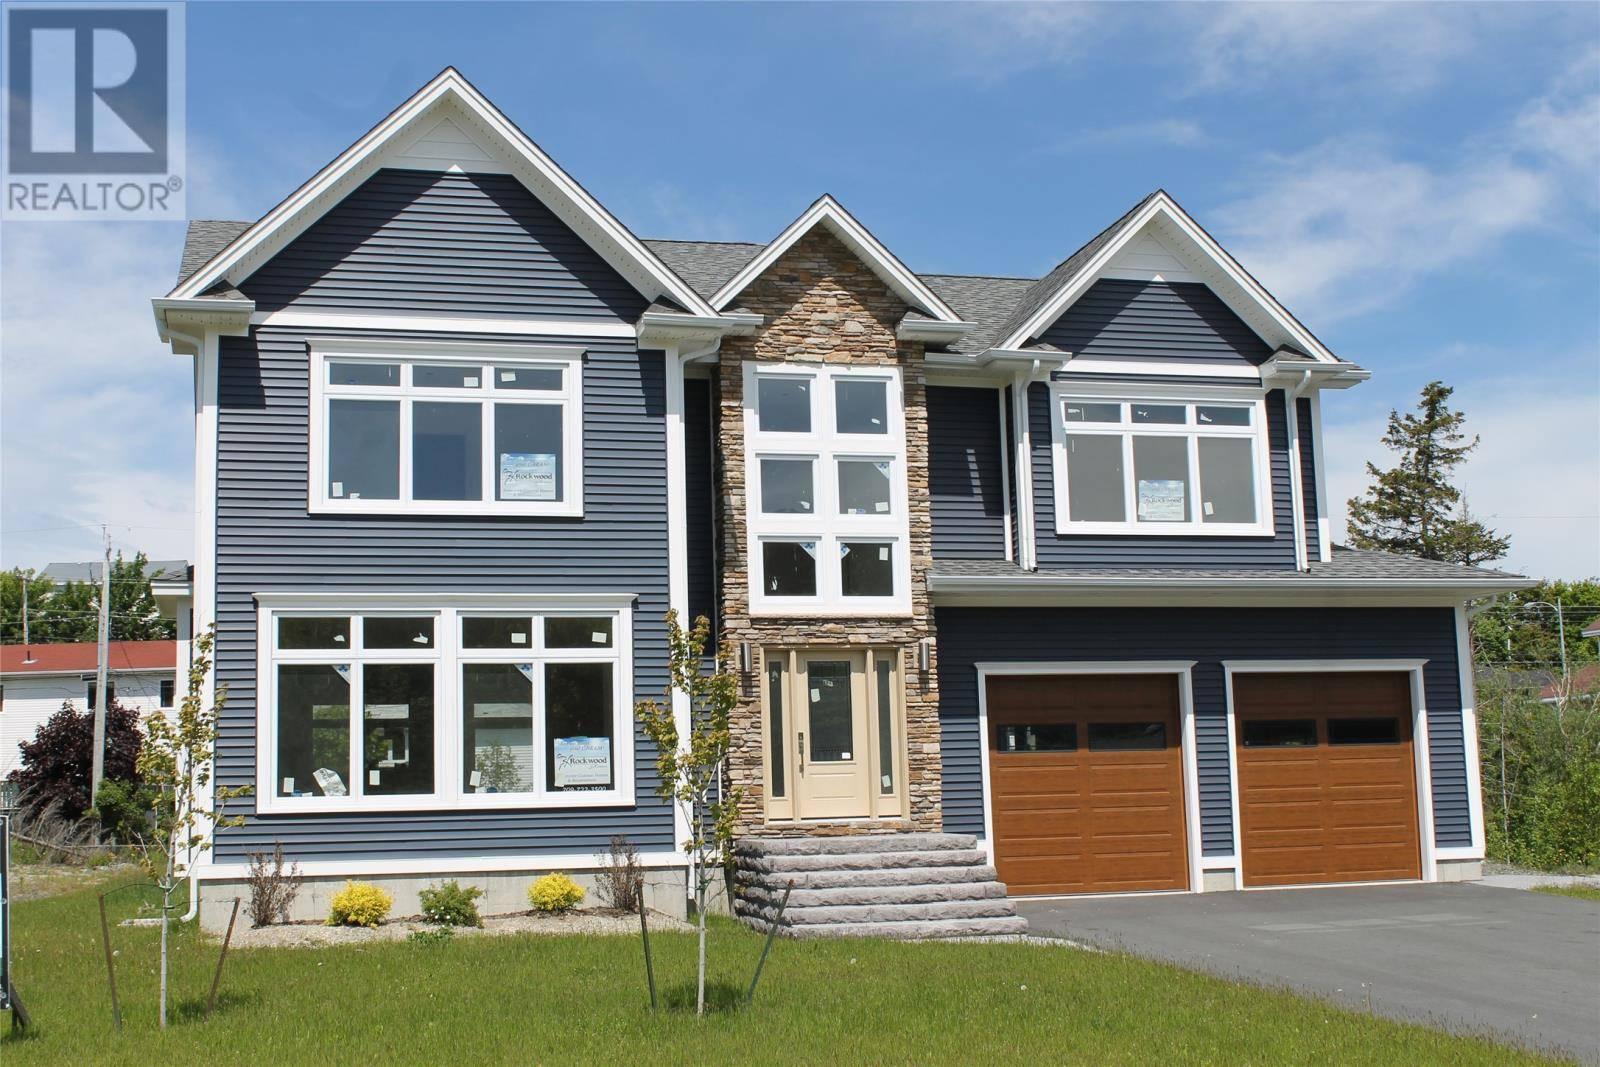 House for sale at 20 Westmount Pl St. John's Newfoundland - MLS: 1188499